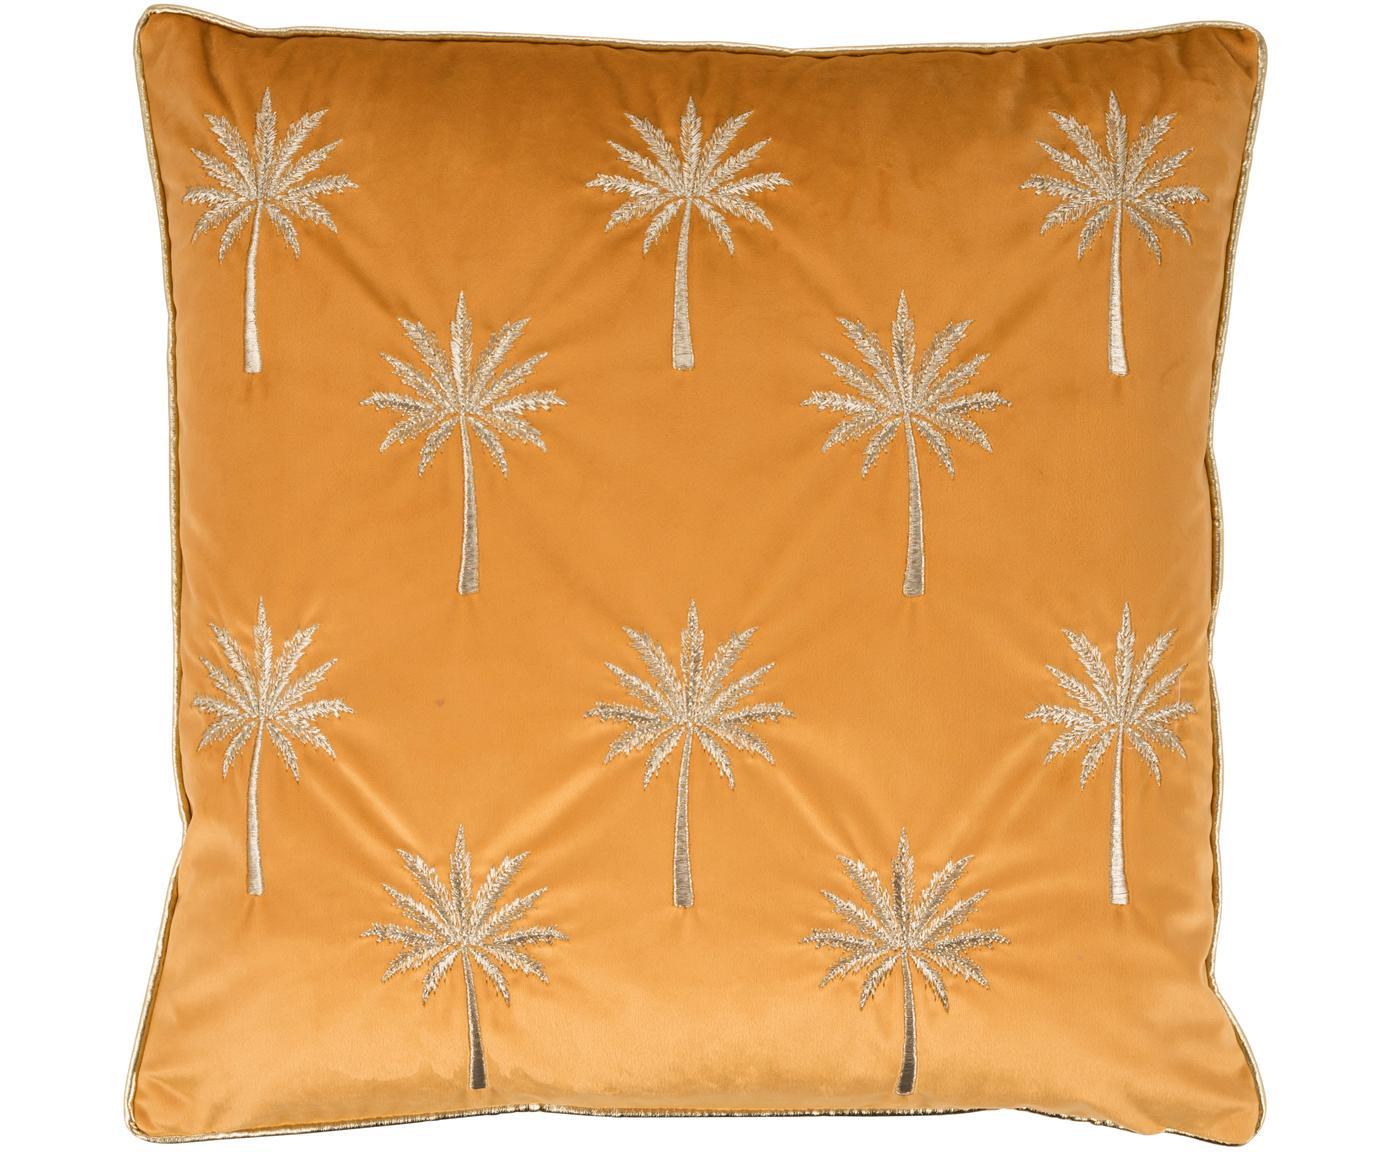 Geborduurde fluwelen kussenhoes Palms met bies, Fluweel (polyester), Oranje-geel, goudkleurig, 45 x 45 cm